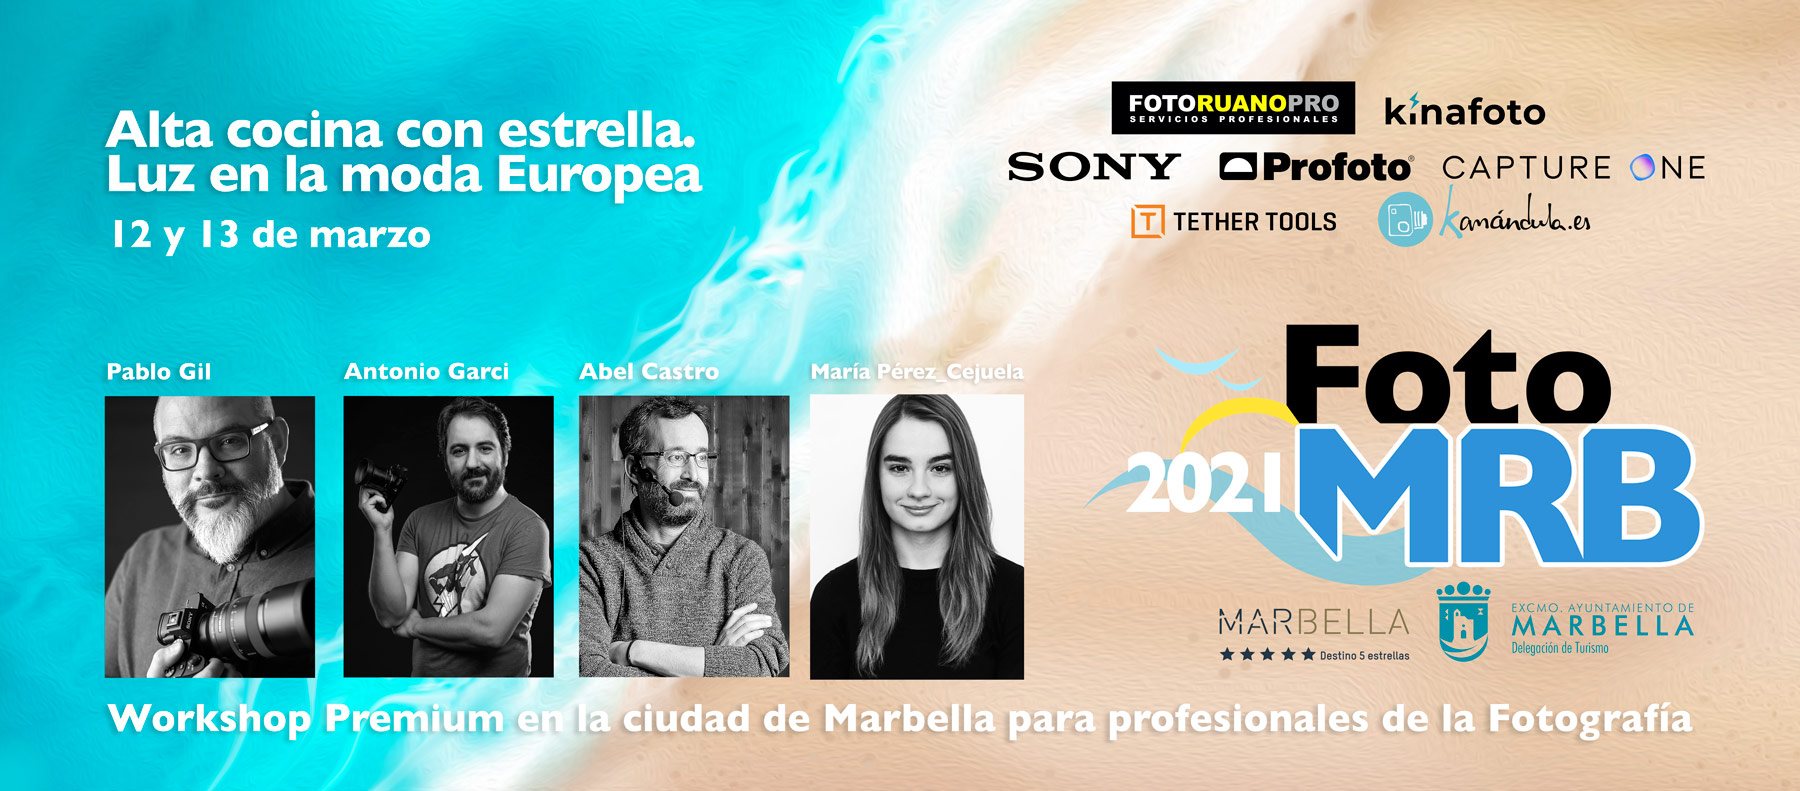 Foto MRB 2021 Marbella Workshop premium